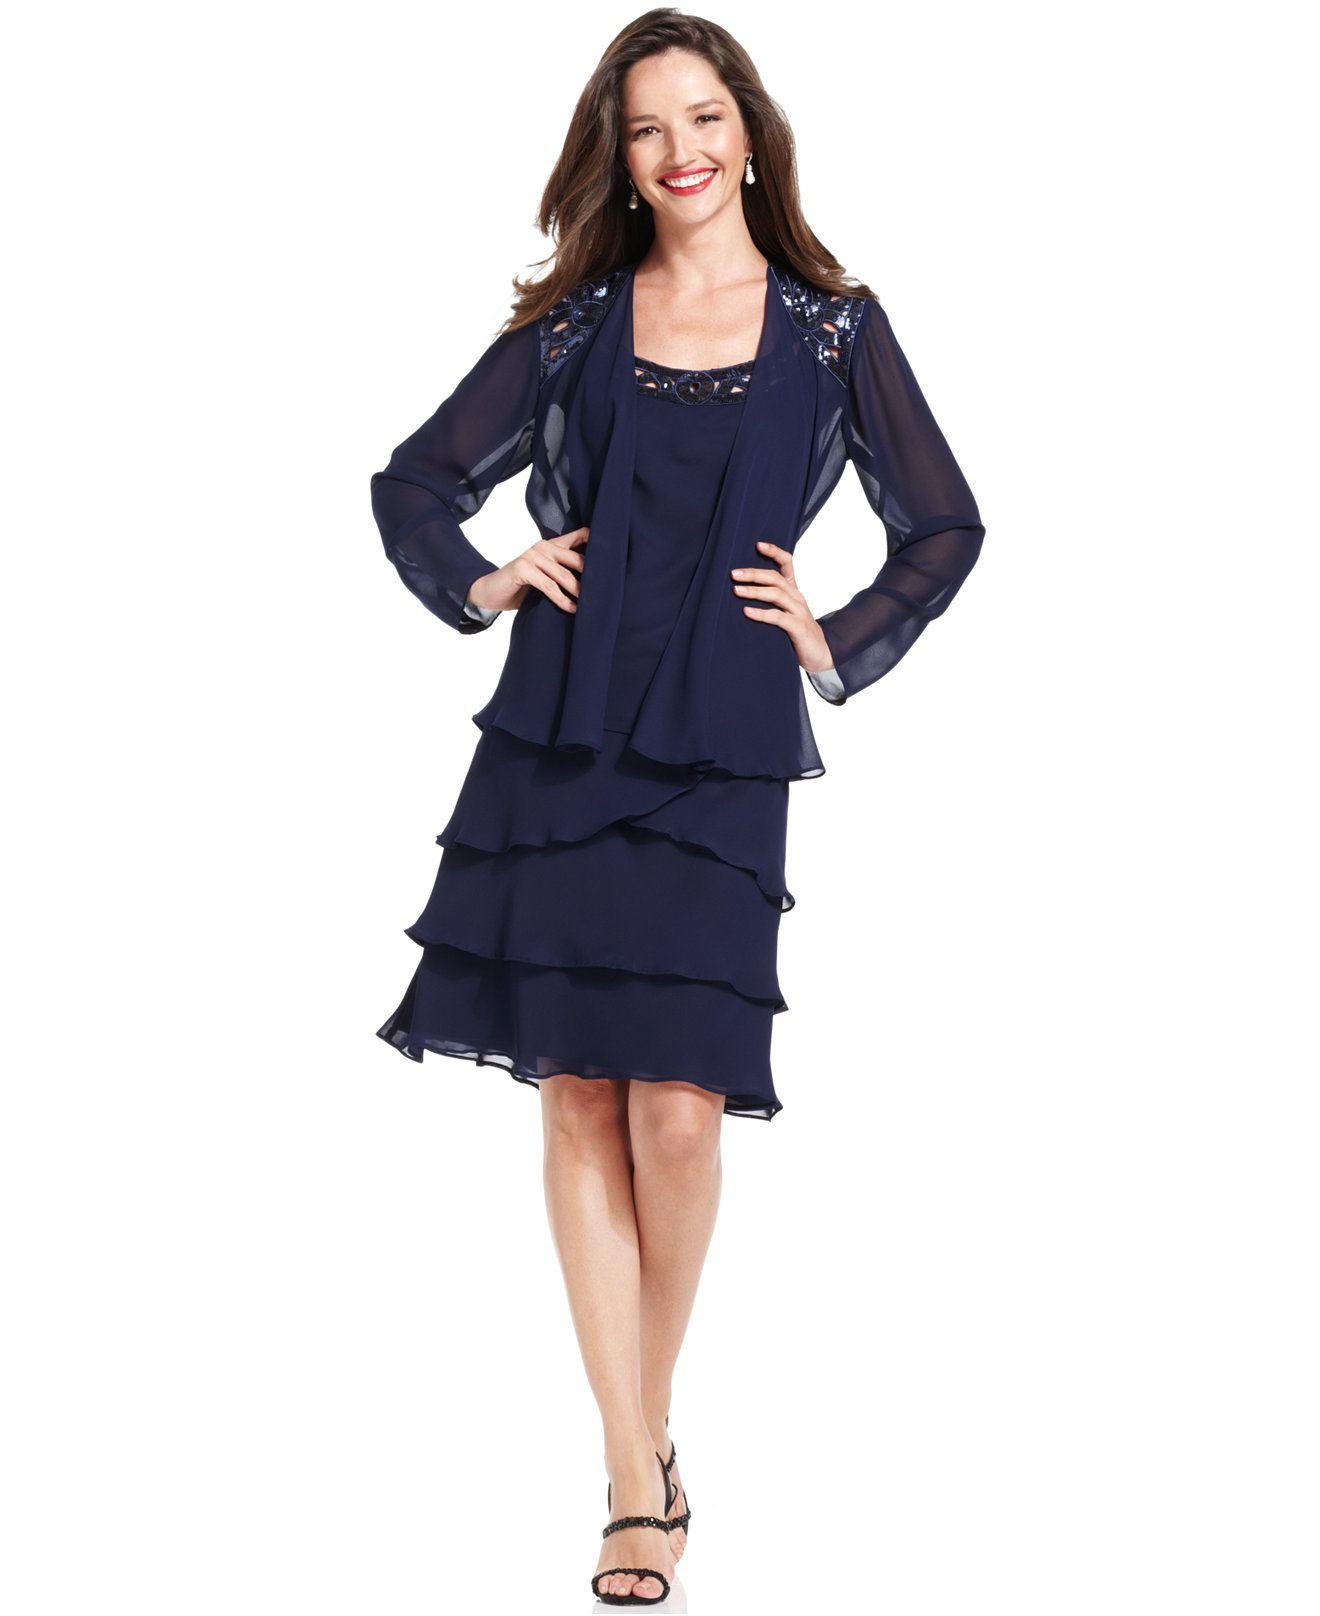 Sl sl fashion dresses - Sl Fashions Sleeveless Sequin Tiered Dress And Jacket Dresses Women Macy S